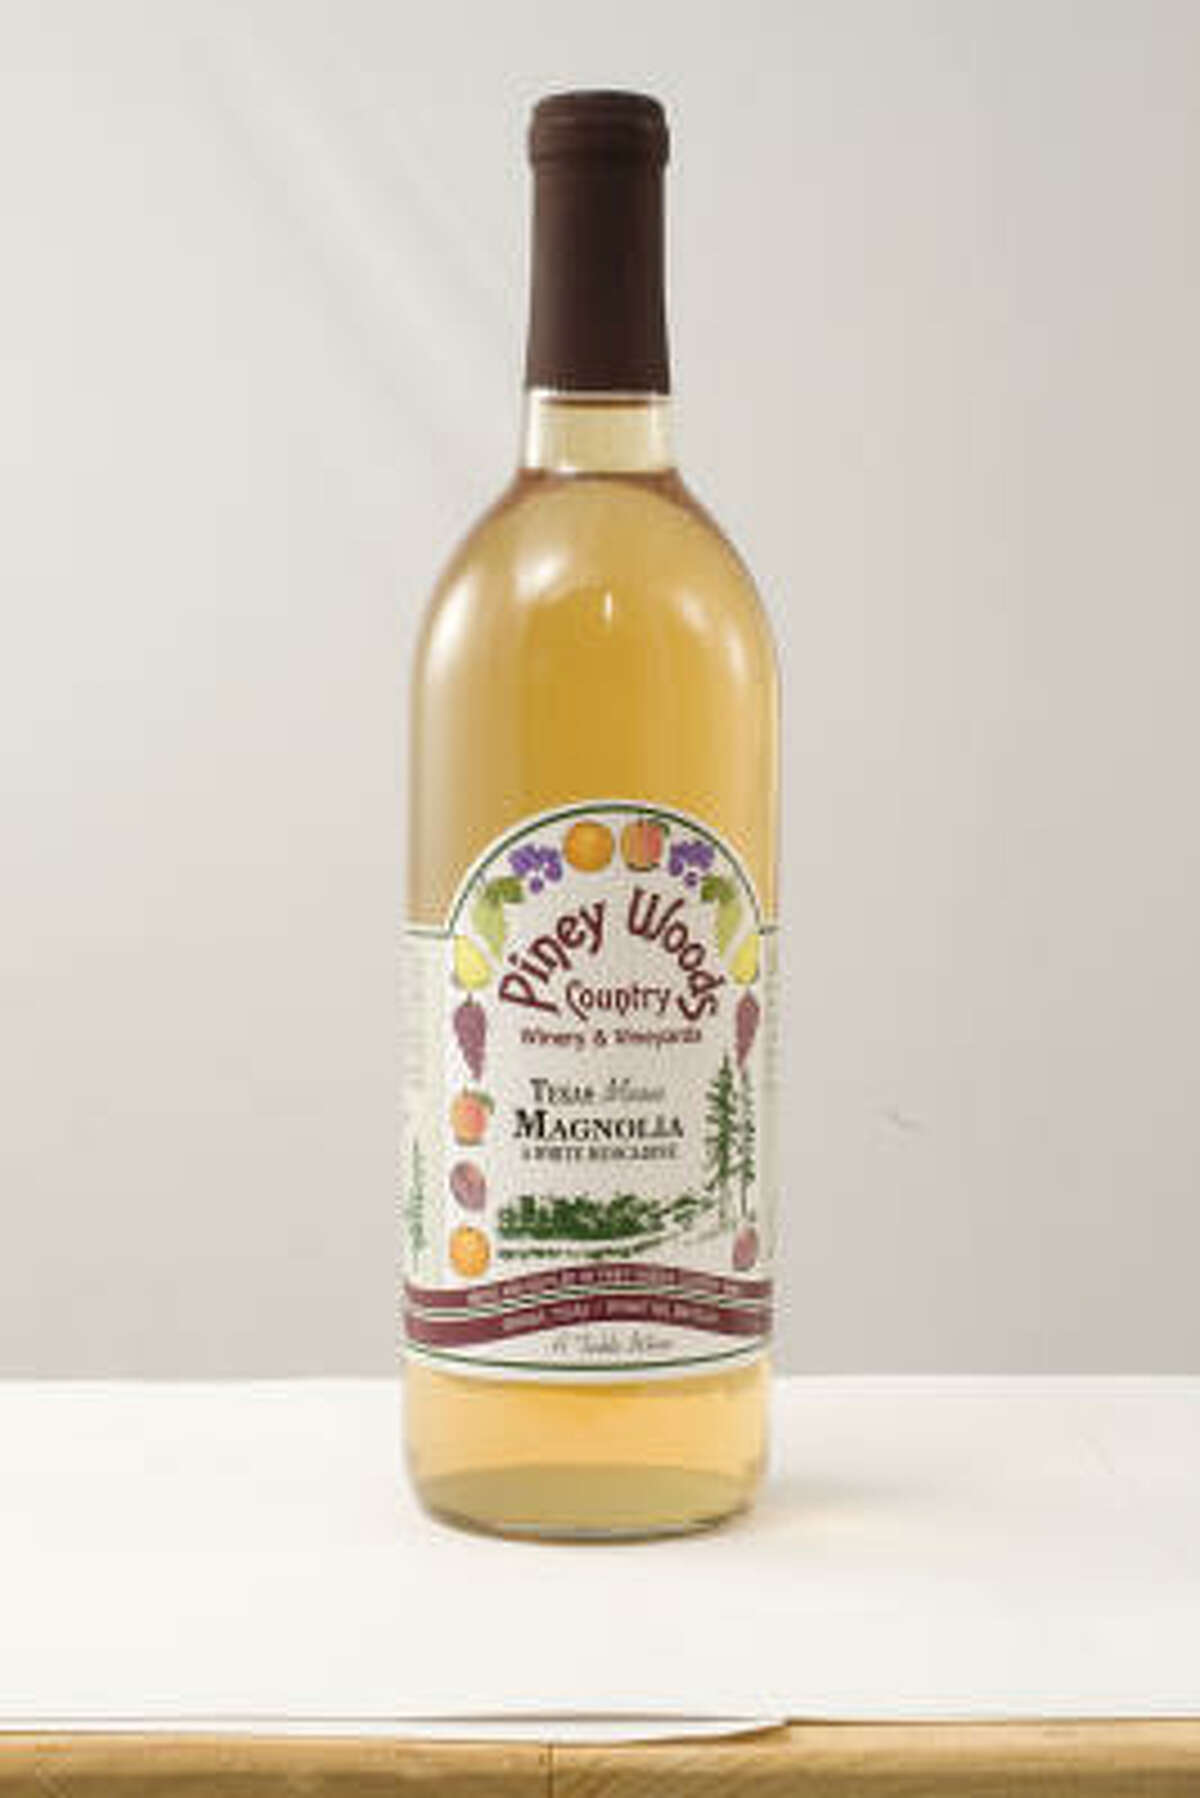 Top Texas Wine: Piney Woods Texas Moon Magnolia (non-vintage).